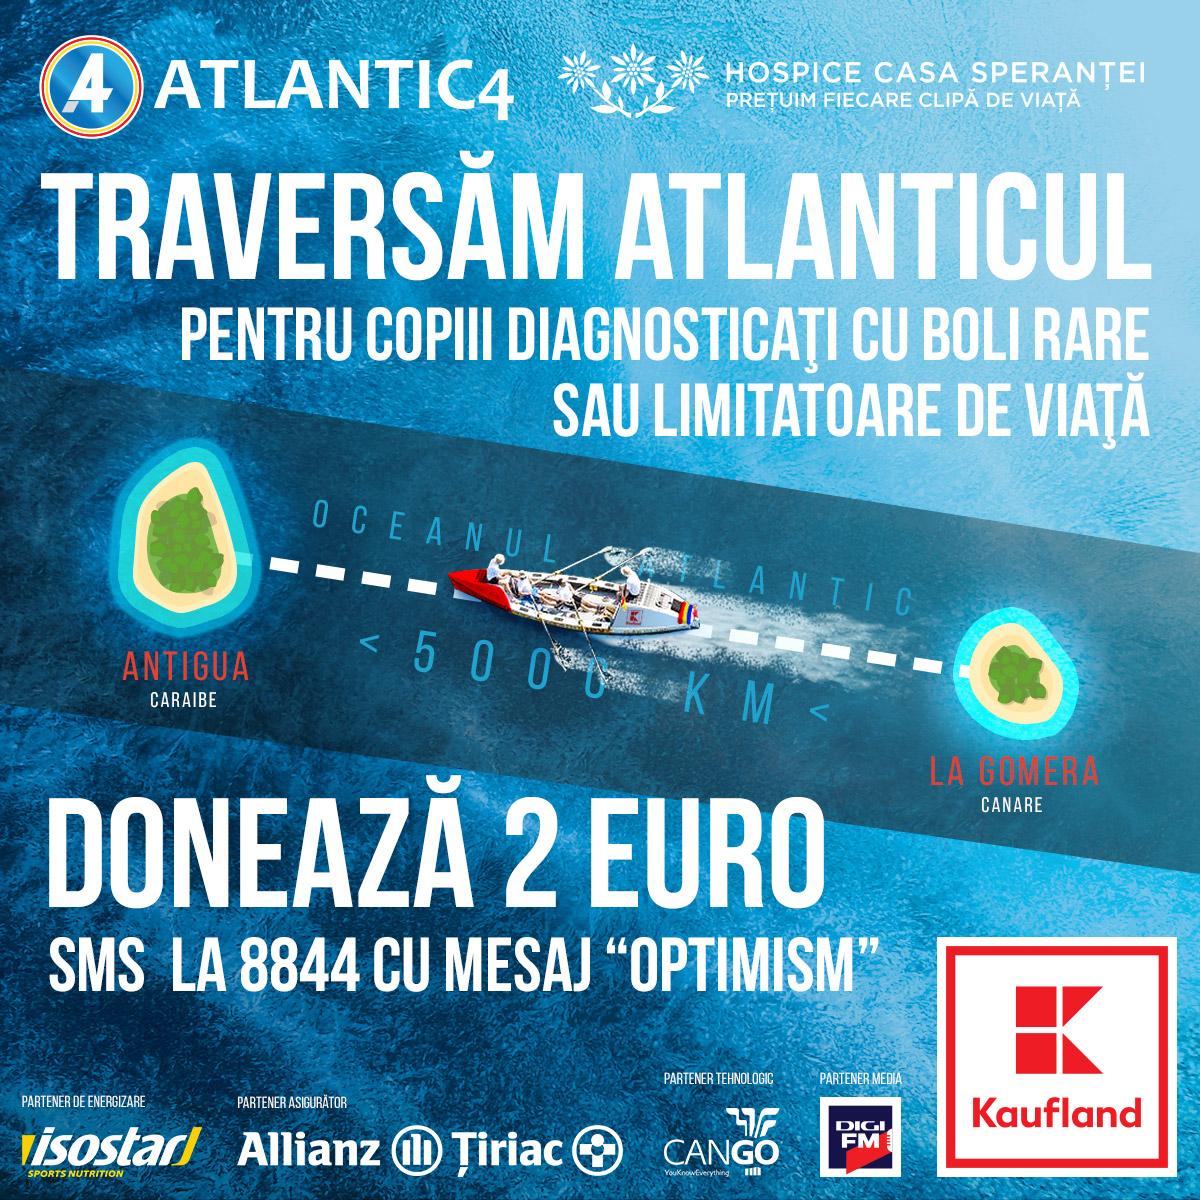 Tenerife Atlantic4